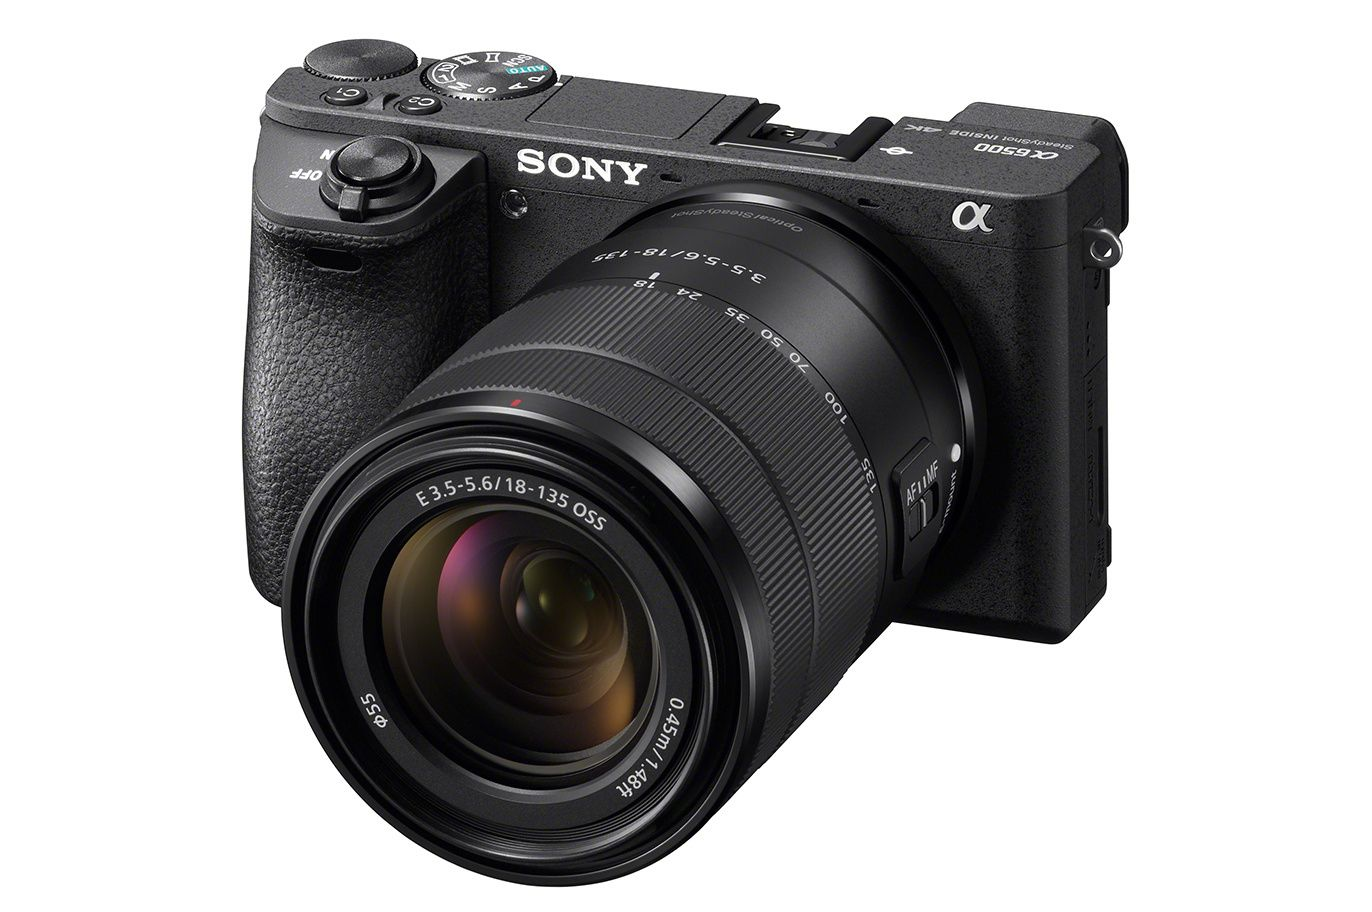 Sony E 18 135mm F 3 5 5 6 Oss Lens Announced Will Cost 598 Sony Camera Mirrorless Camera Digital Camera